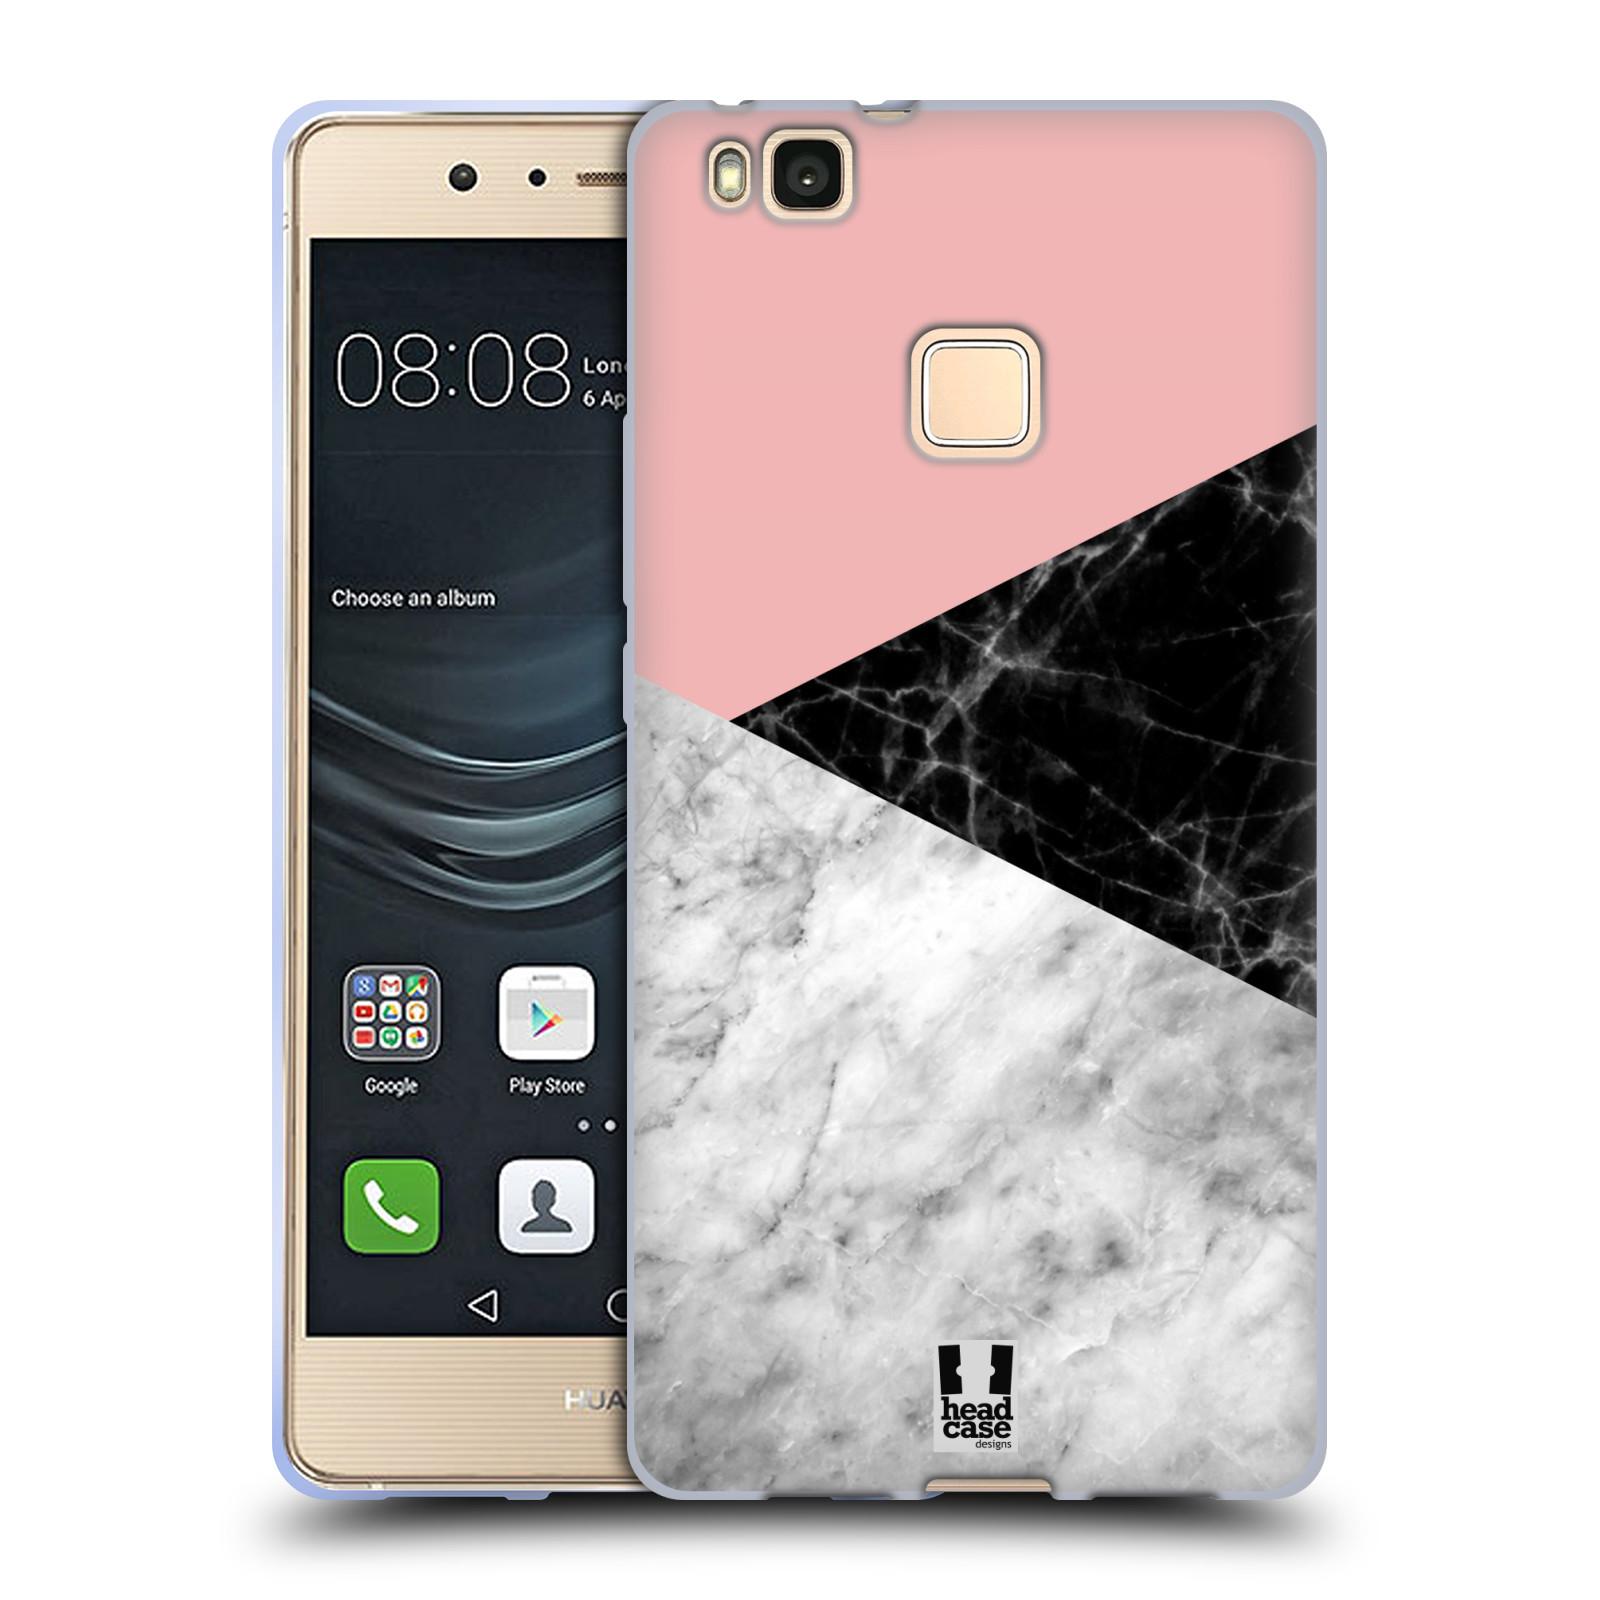 Silikonové pouzdro na mobil Huawei P9 Lite - Head Case - Mramor mix